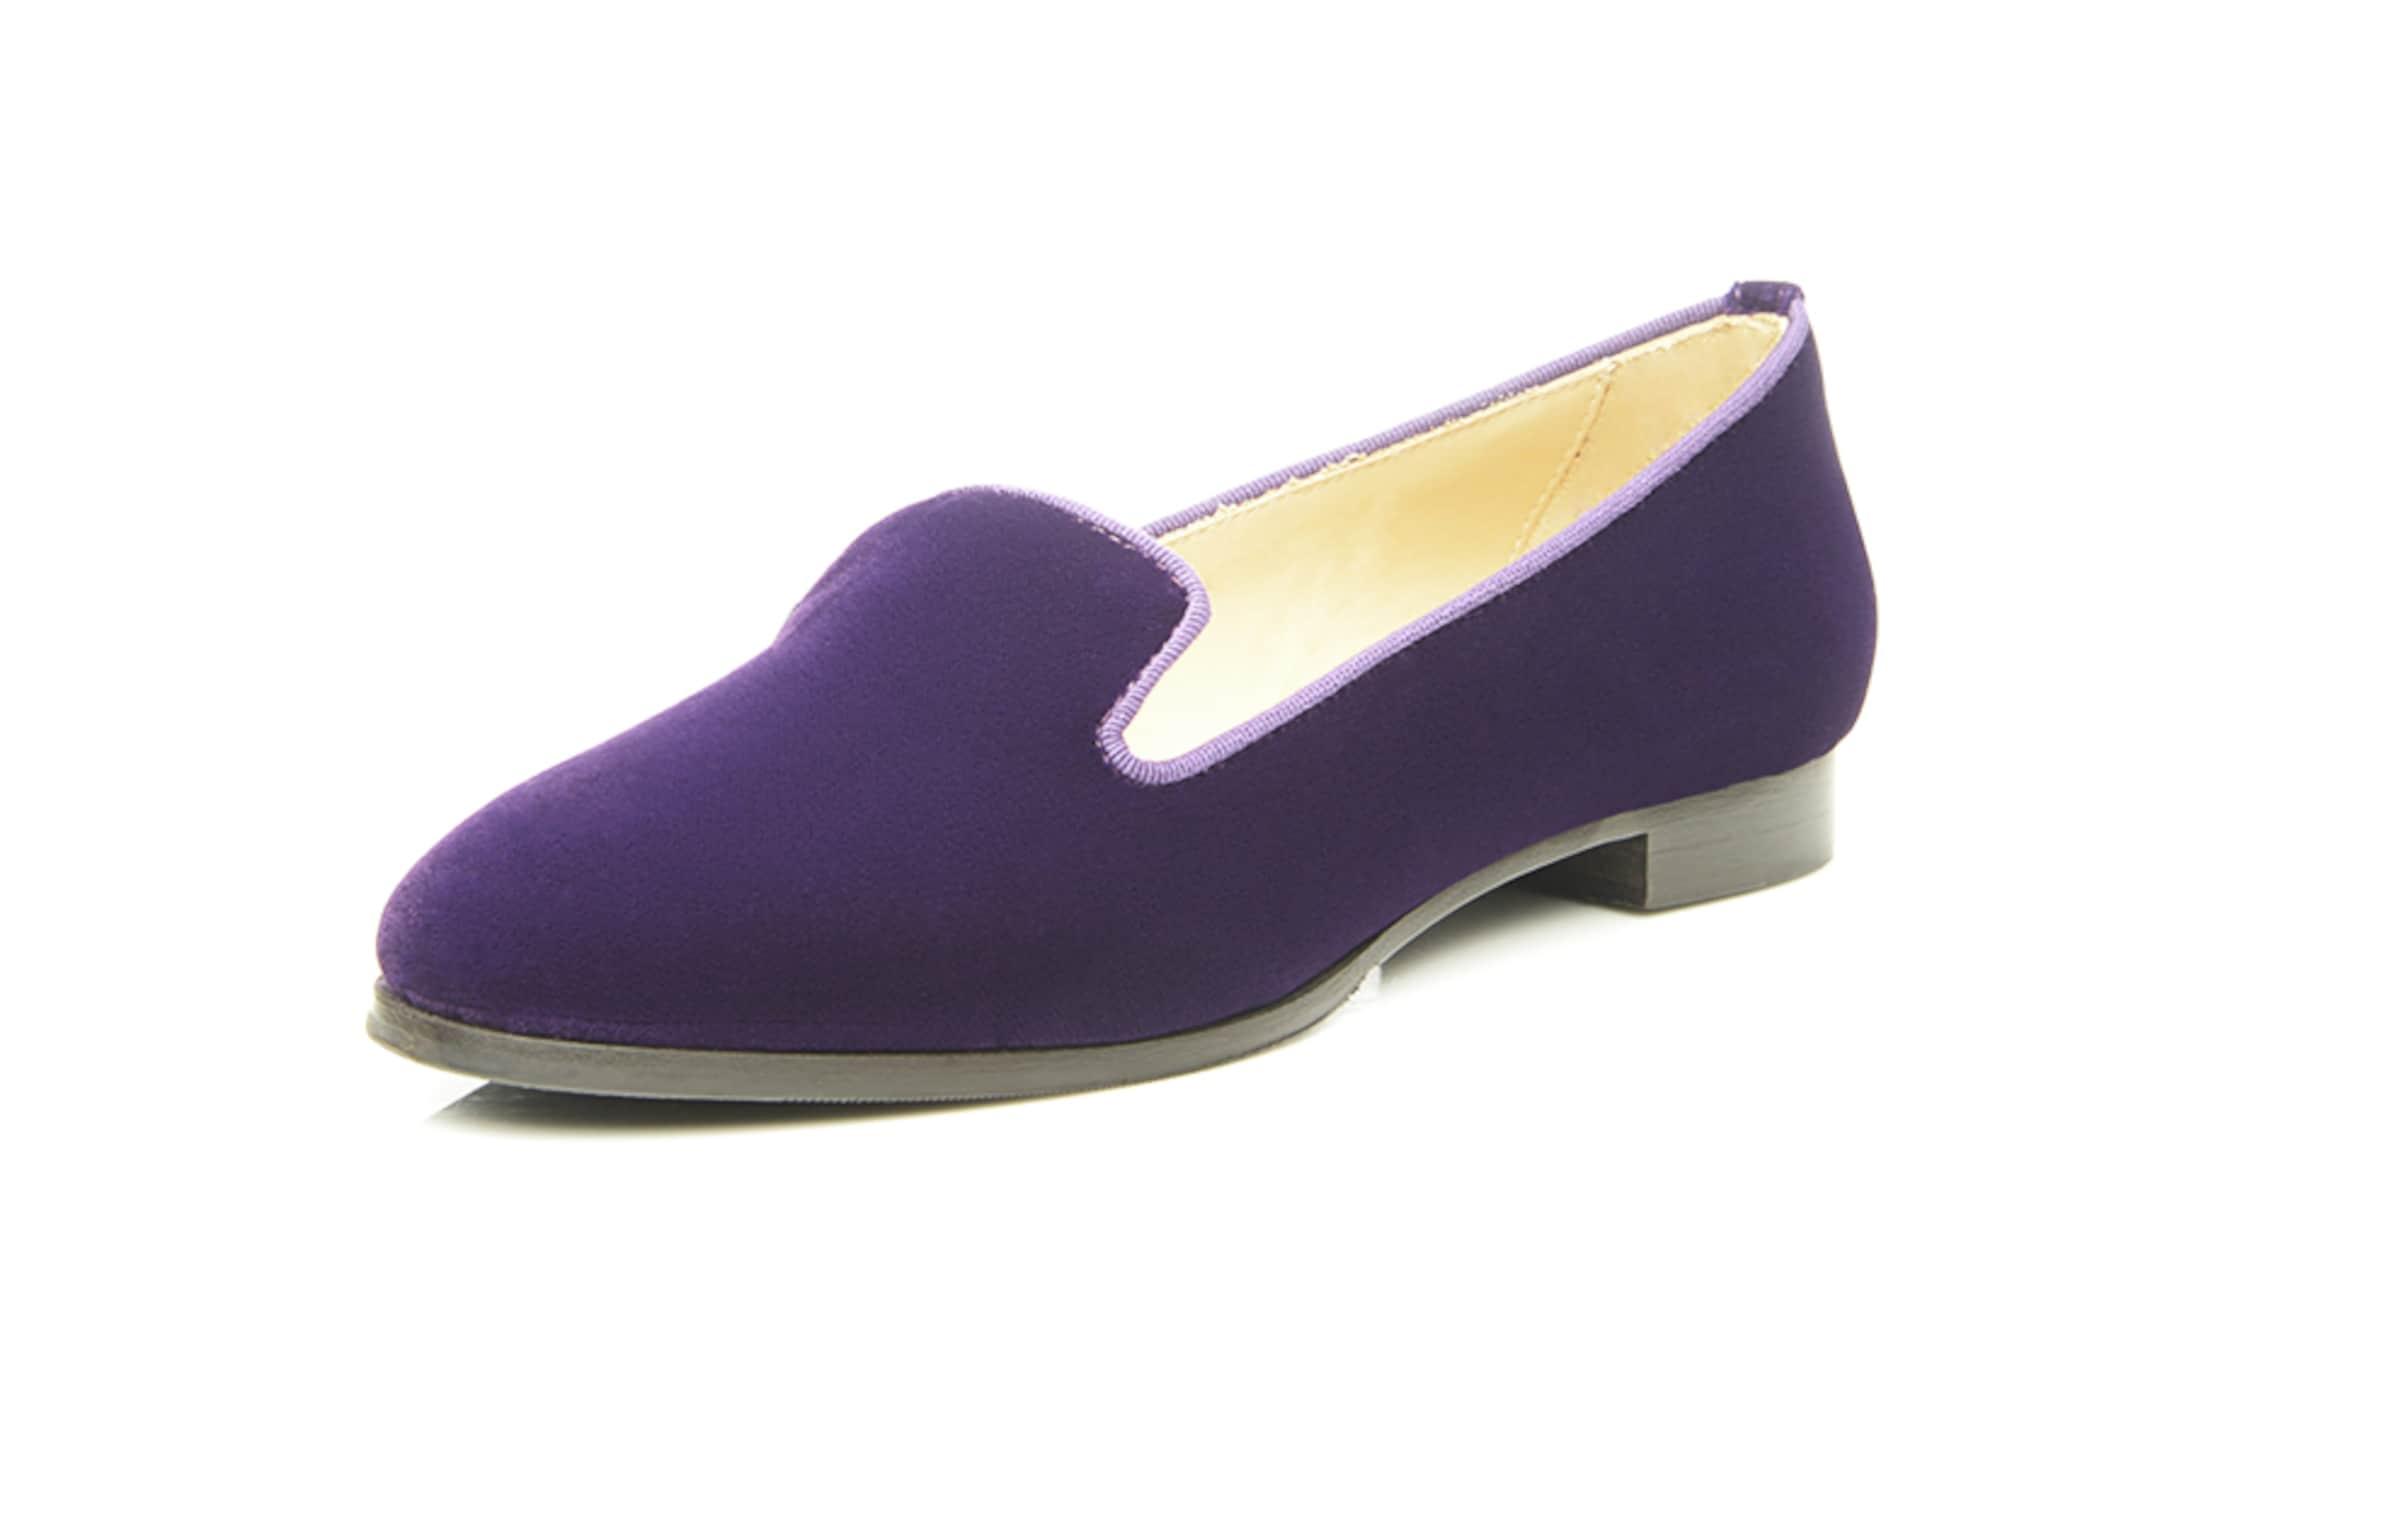 SHOEPASSION | Loafer 'No. 77 WL' Schuhe Gut getragene Schuhe